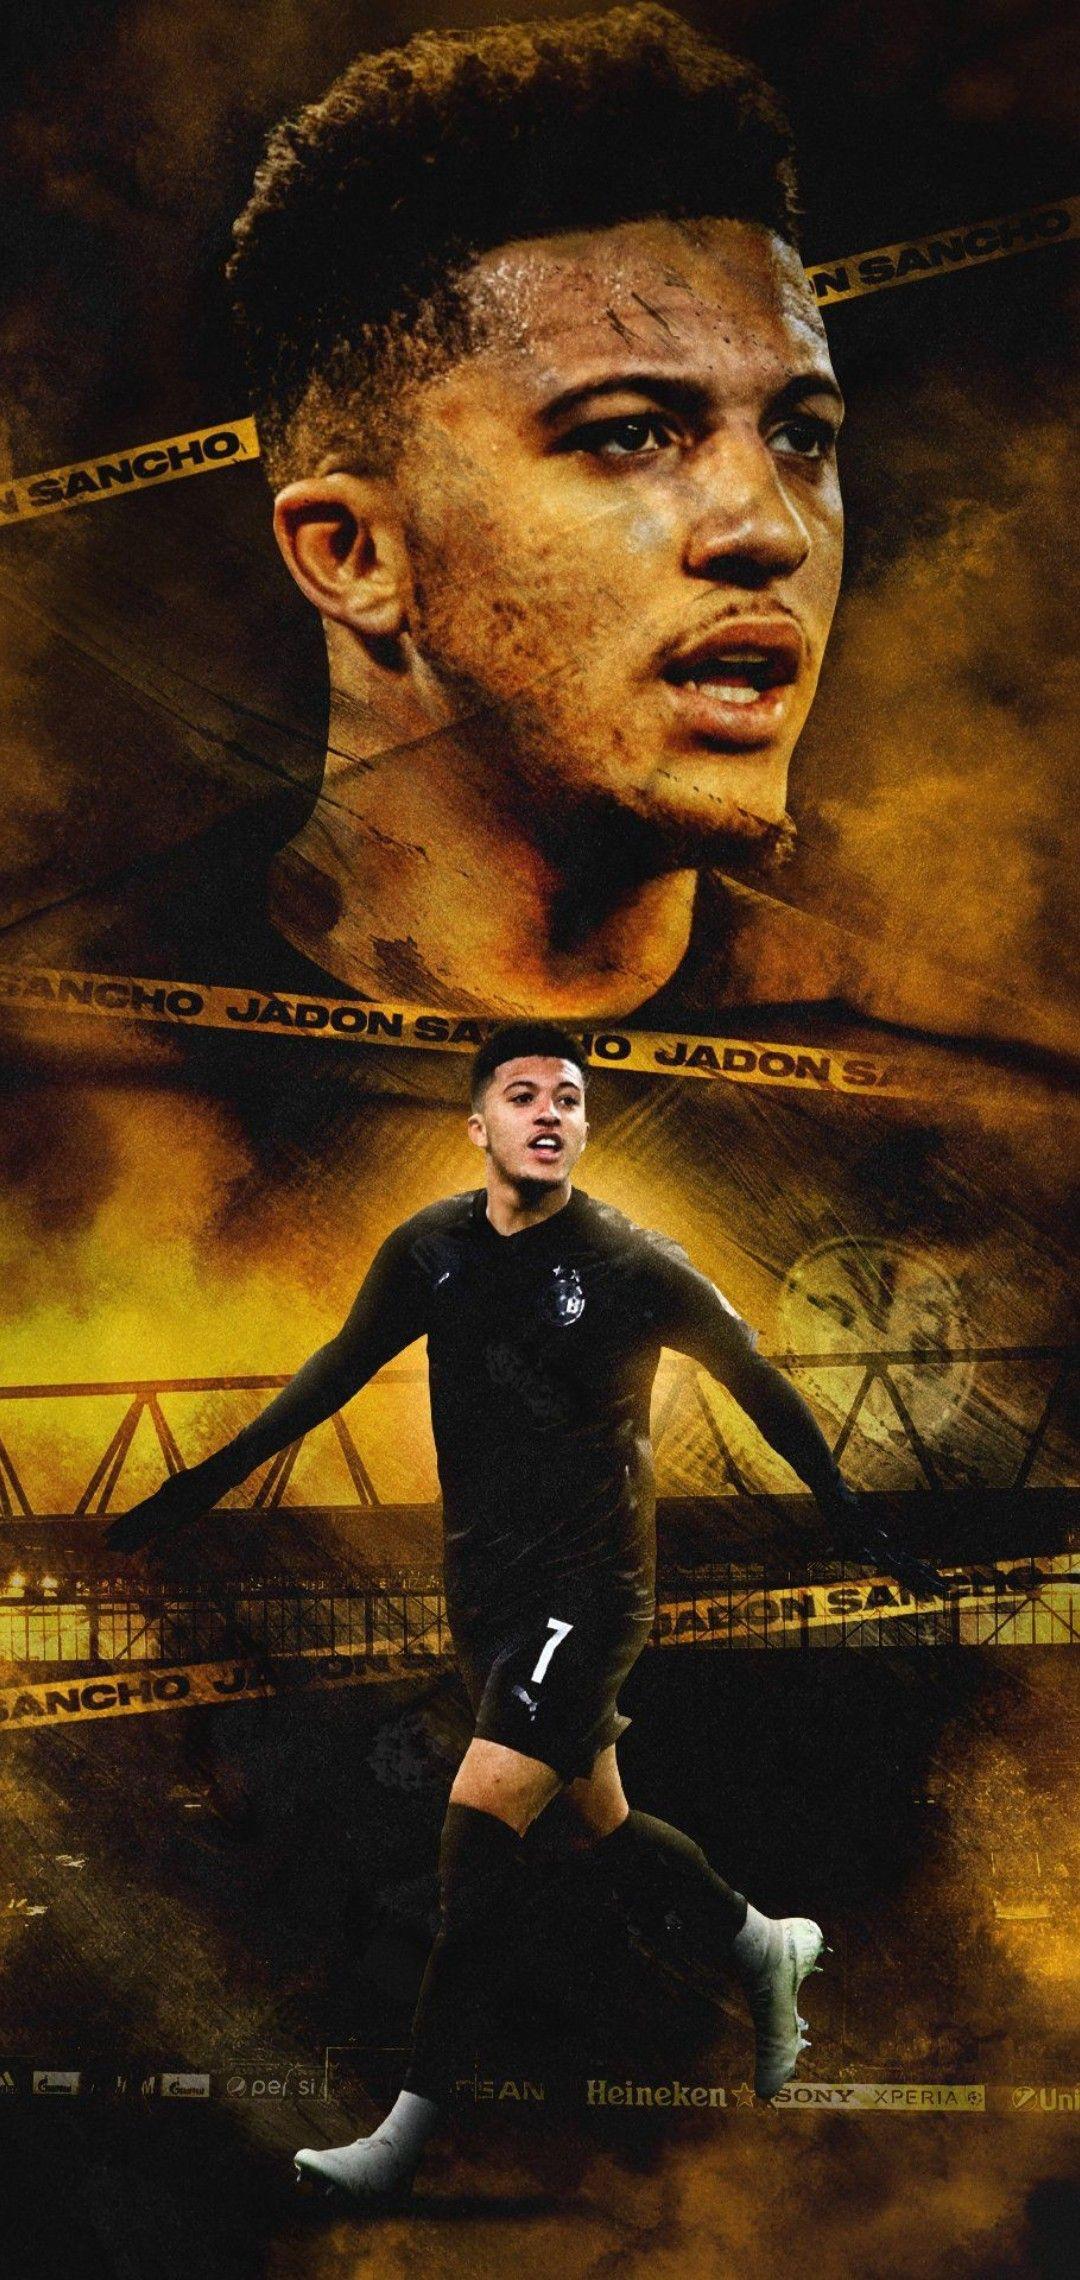 Pin Von John King Auf Football Bvb Dortmund Dortmund Borussia Dortmund